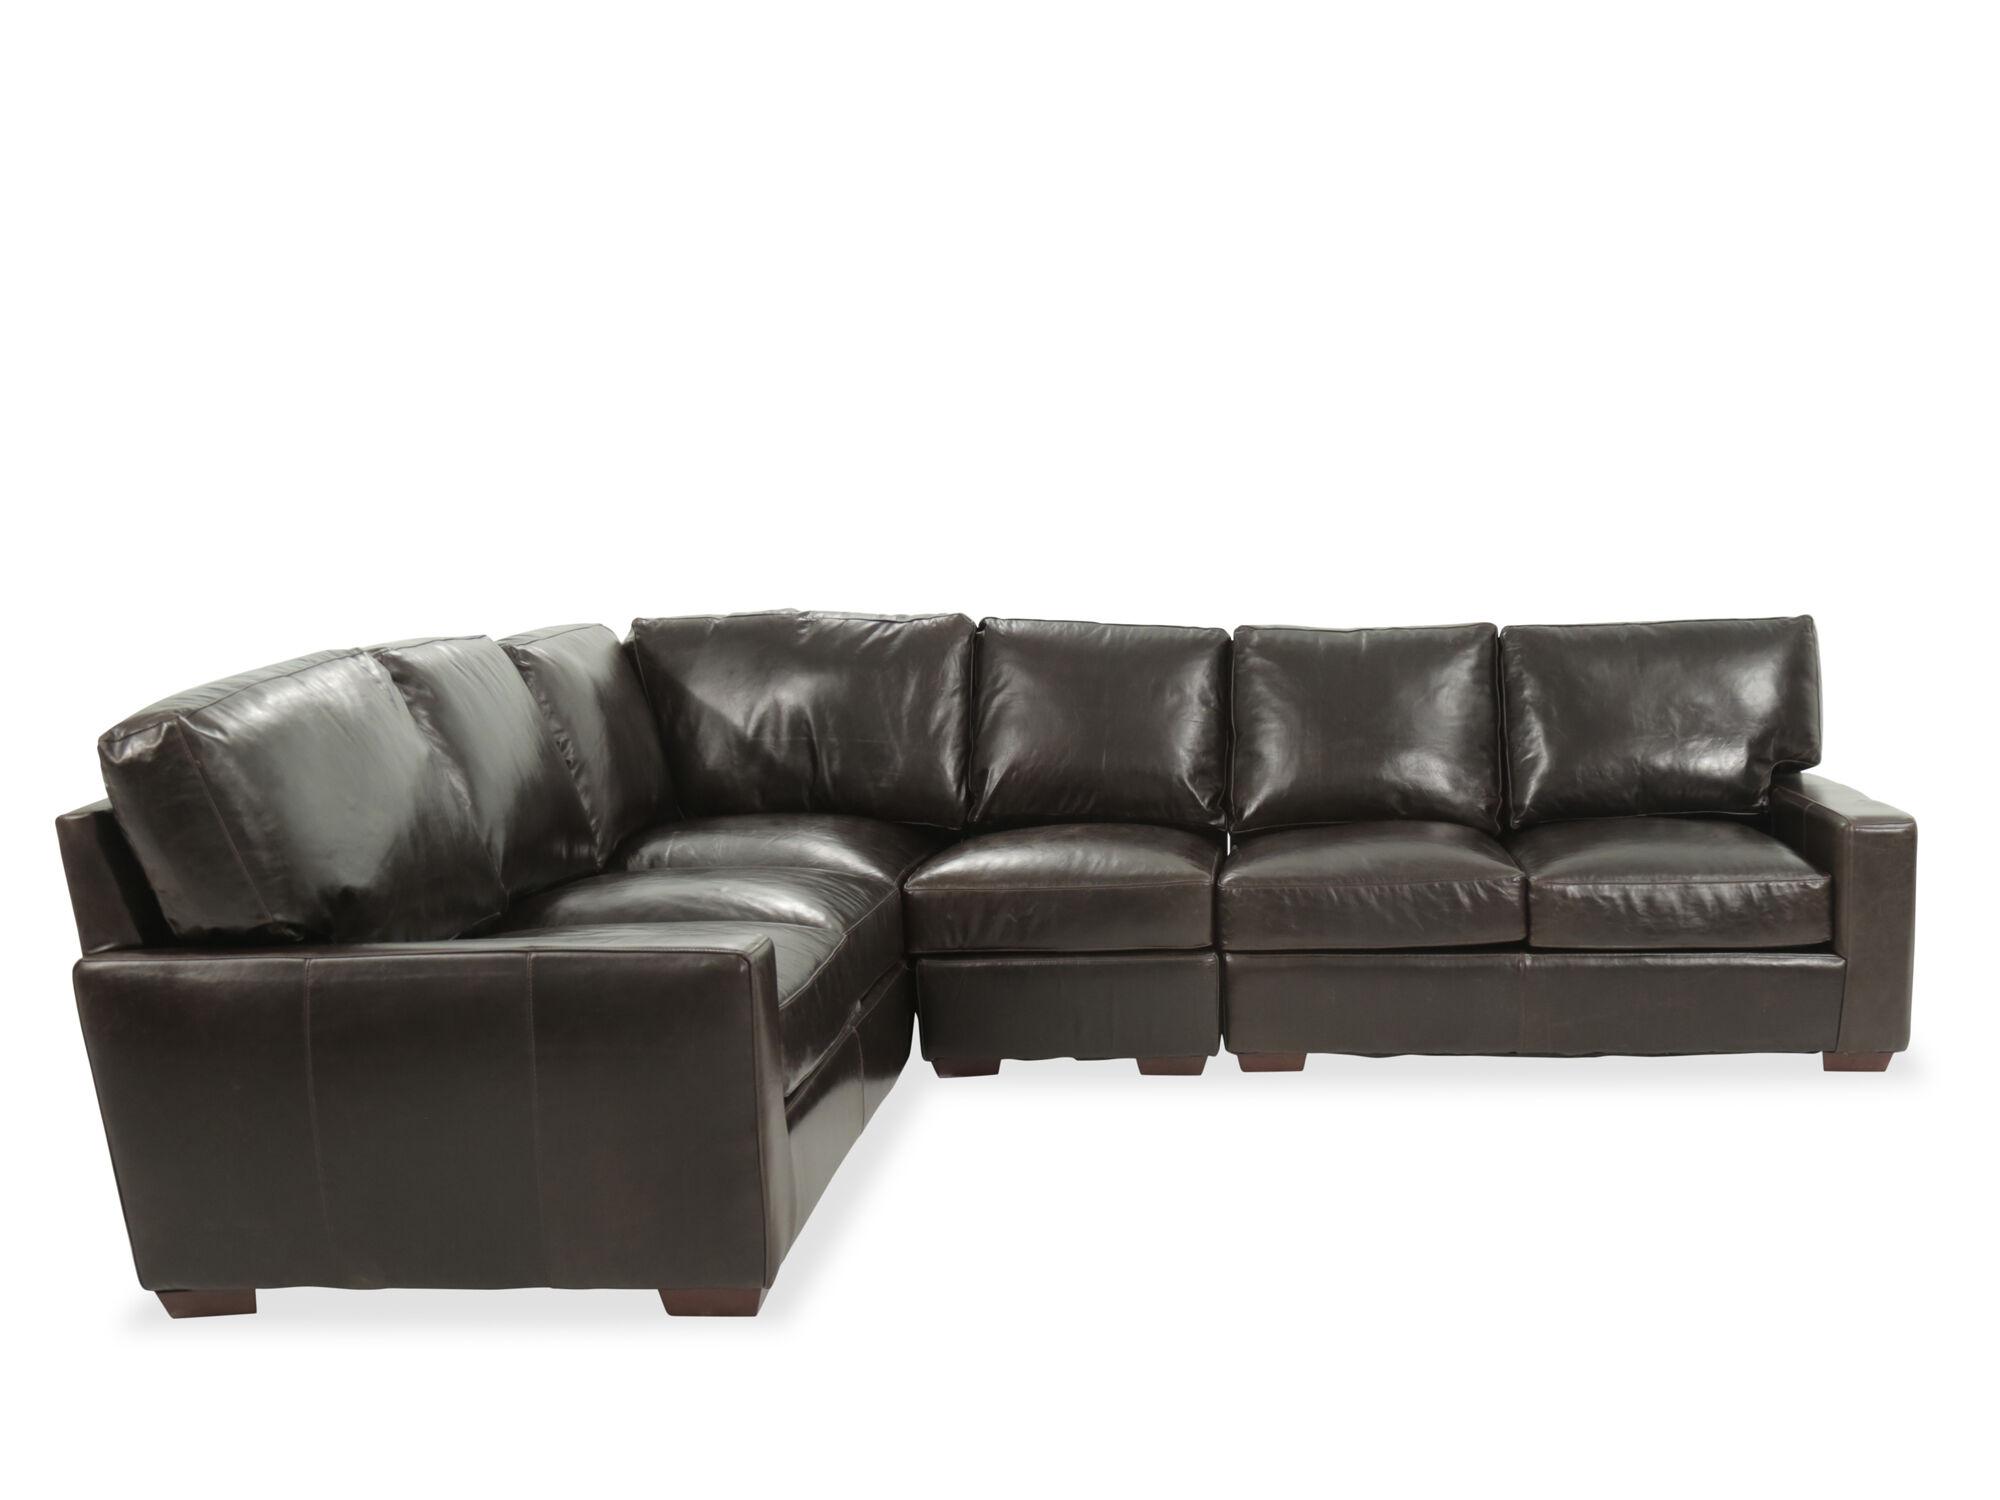 next brompton leather sofa newton chaise sleeper usa tobacco four piece sectional mathis